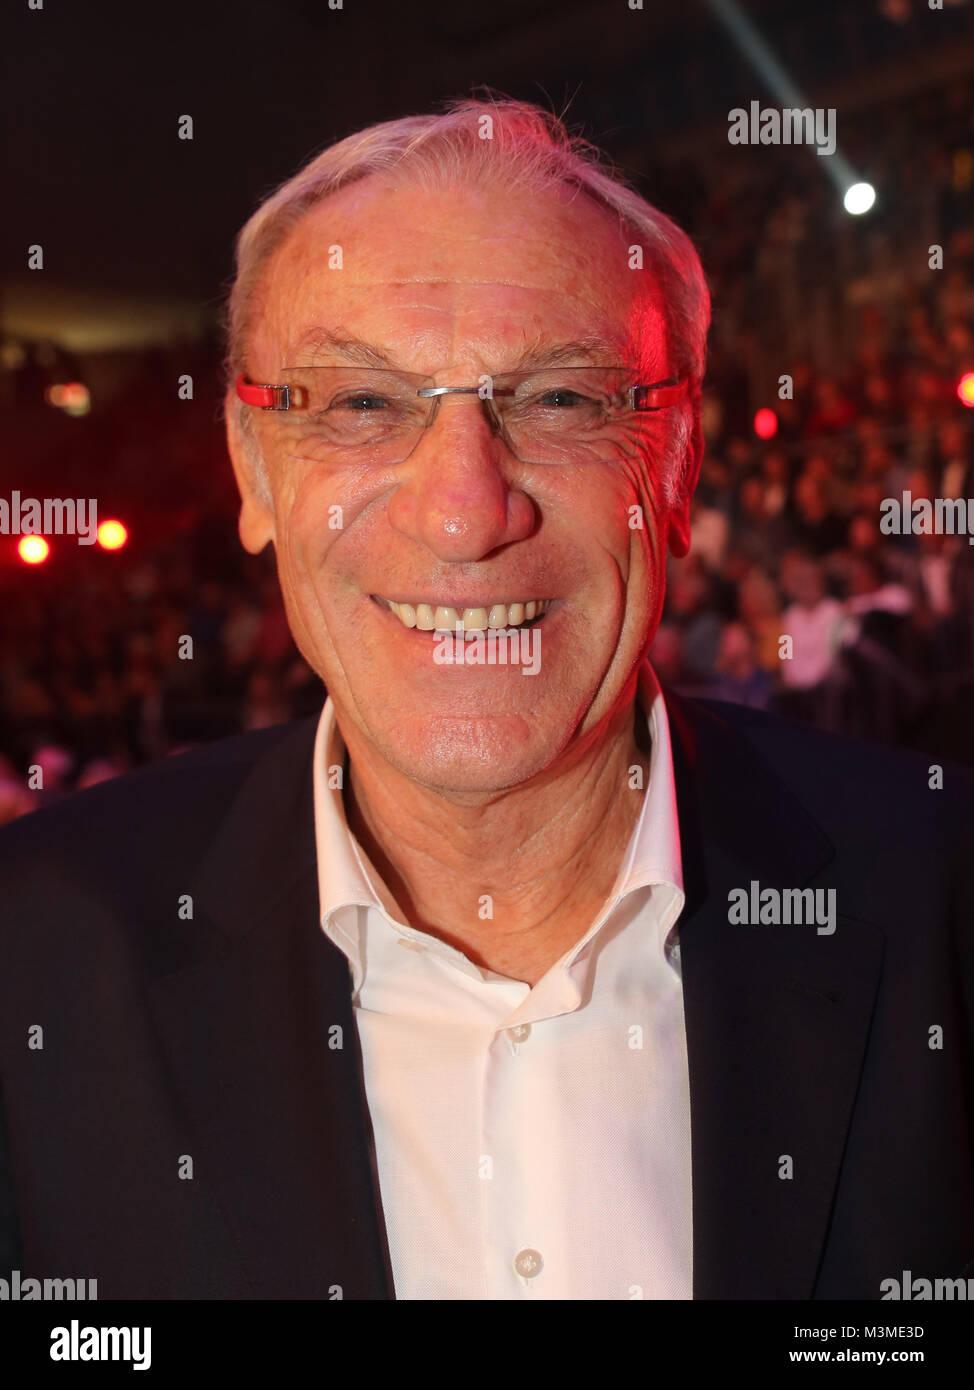 Fußballtrainer Legende Eduard-EDE-Geyer- Ehrengast bei der SES-Box-Gala am 12.11.2016 in der  GETEC Arena Magdeburg - Stock Image